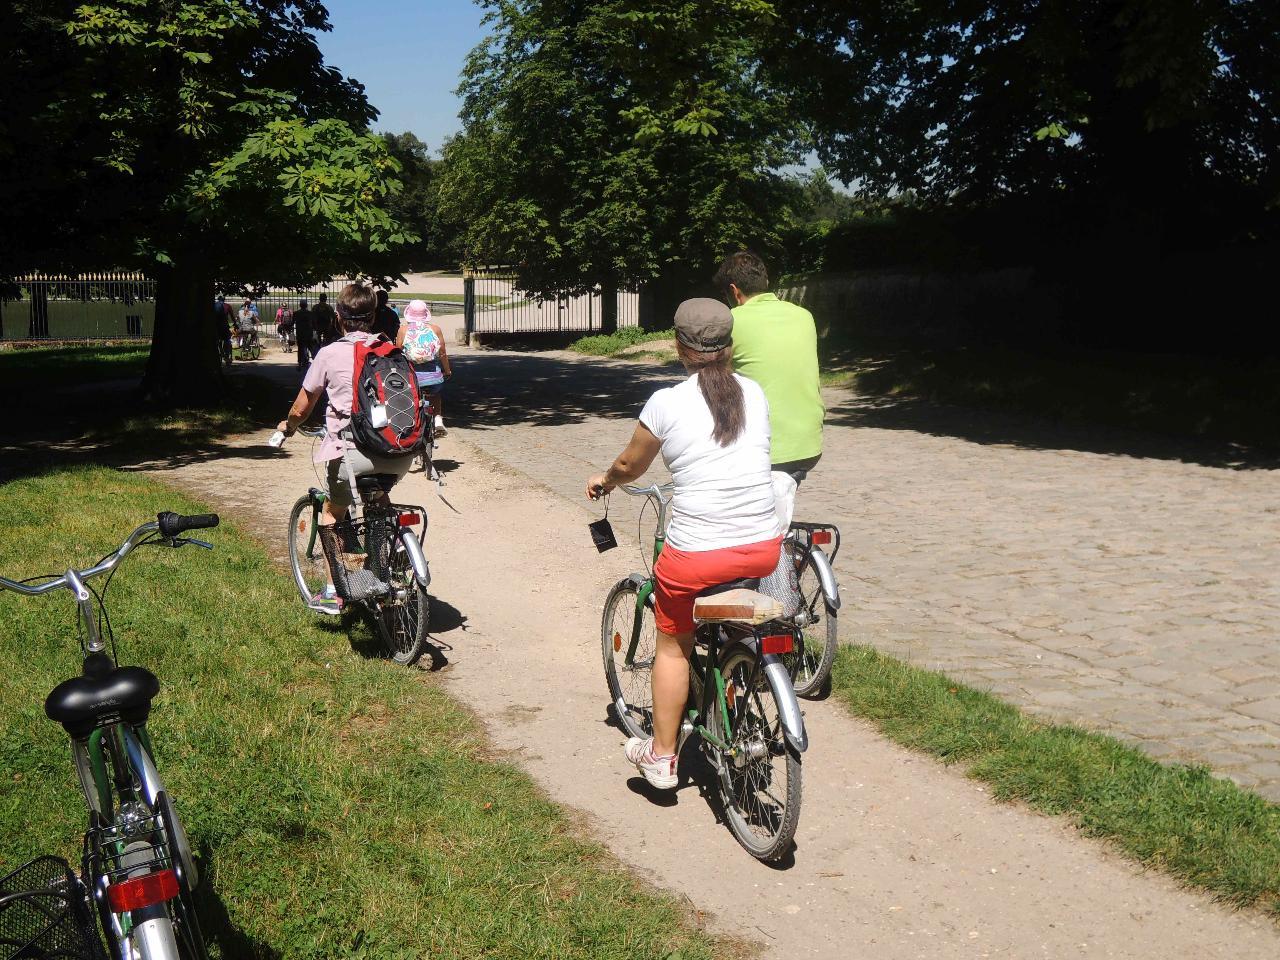 versailles bike tour bike about tours reservations. Black Bedroom Furniture Sets. Home Design Ideas